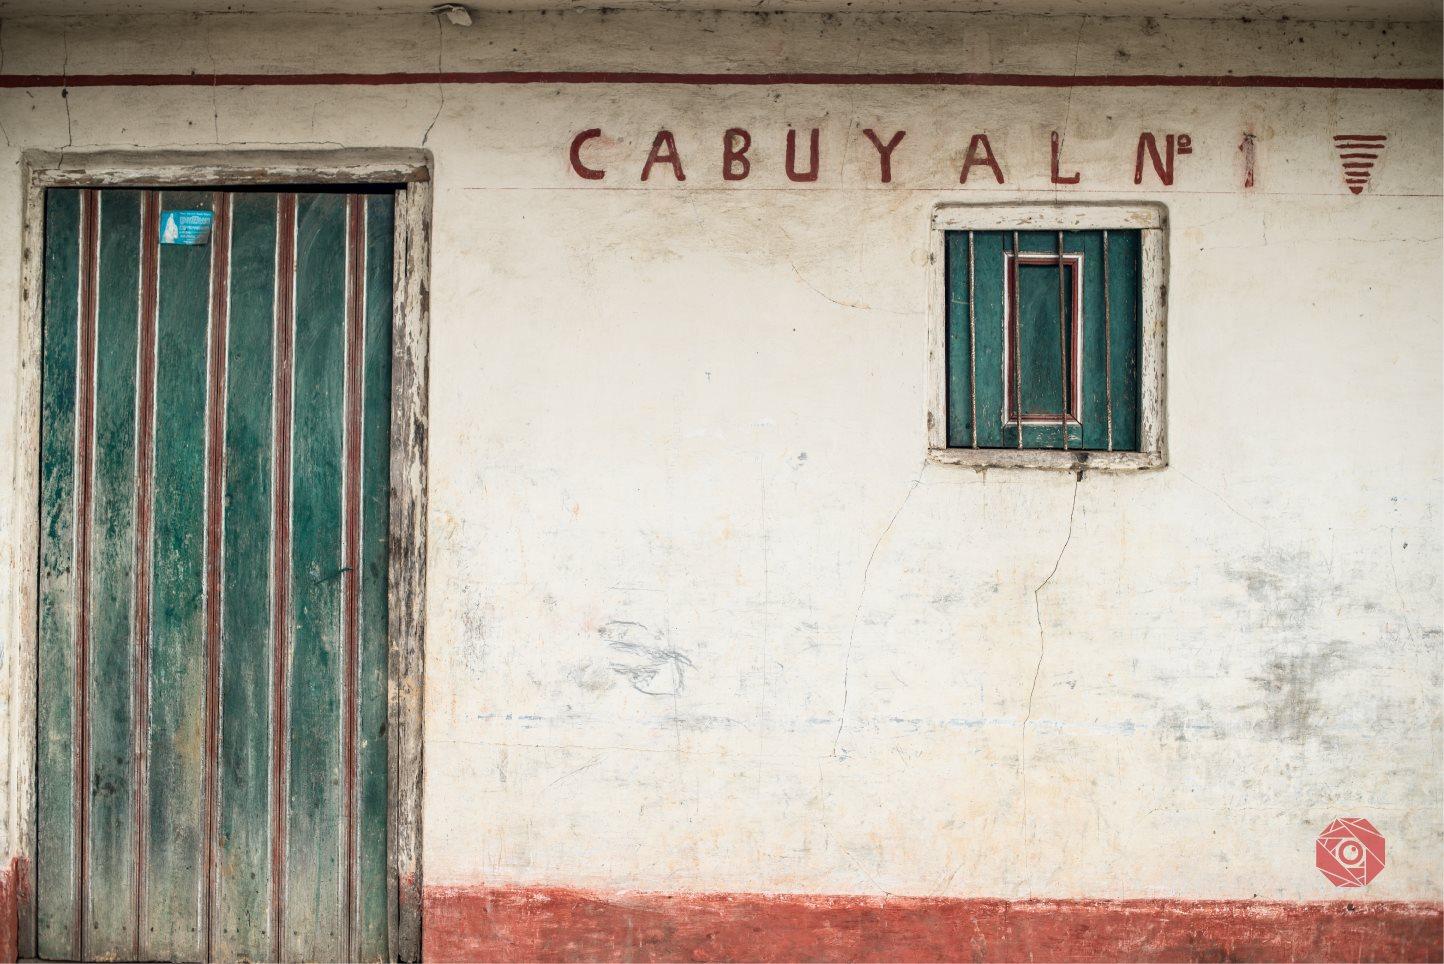 Cabuyal